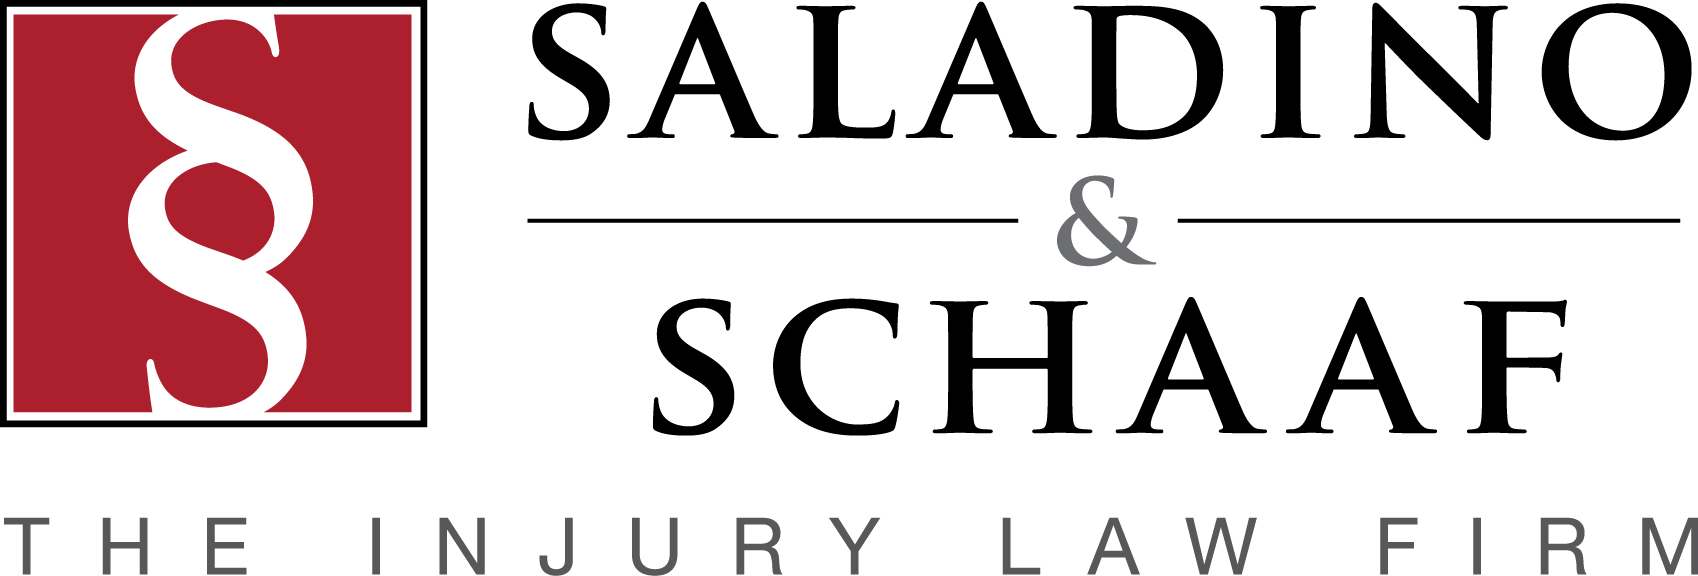 Saladino&Schaaf_logo